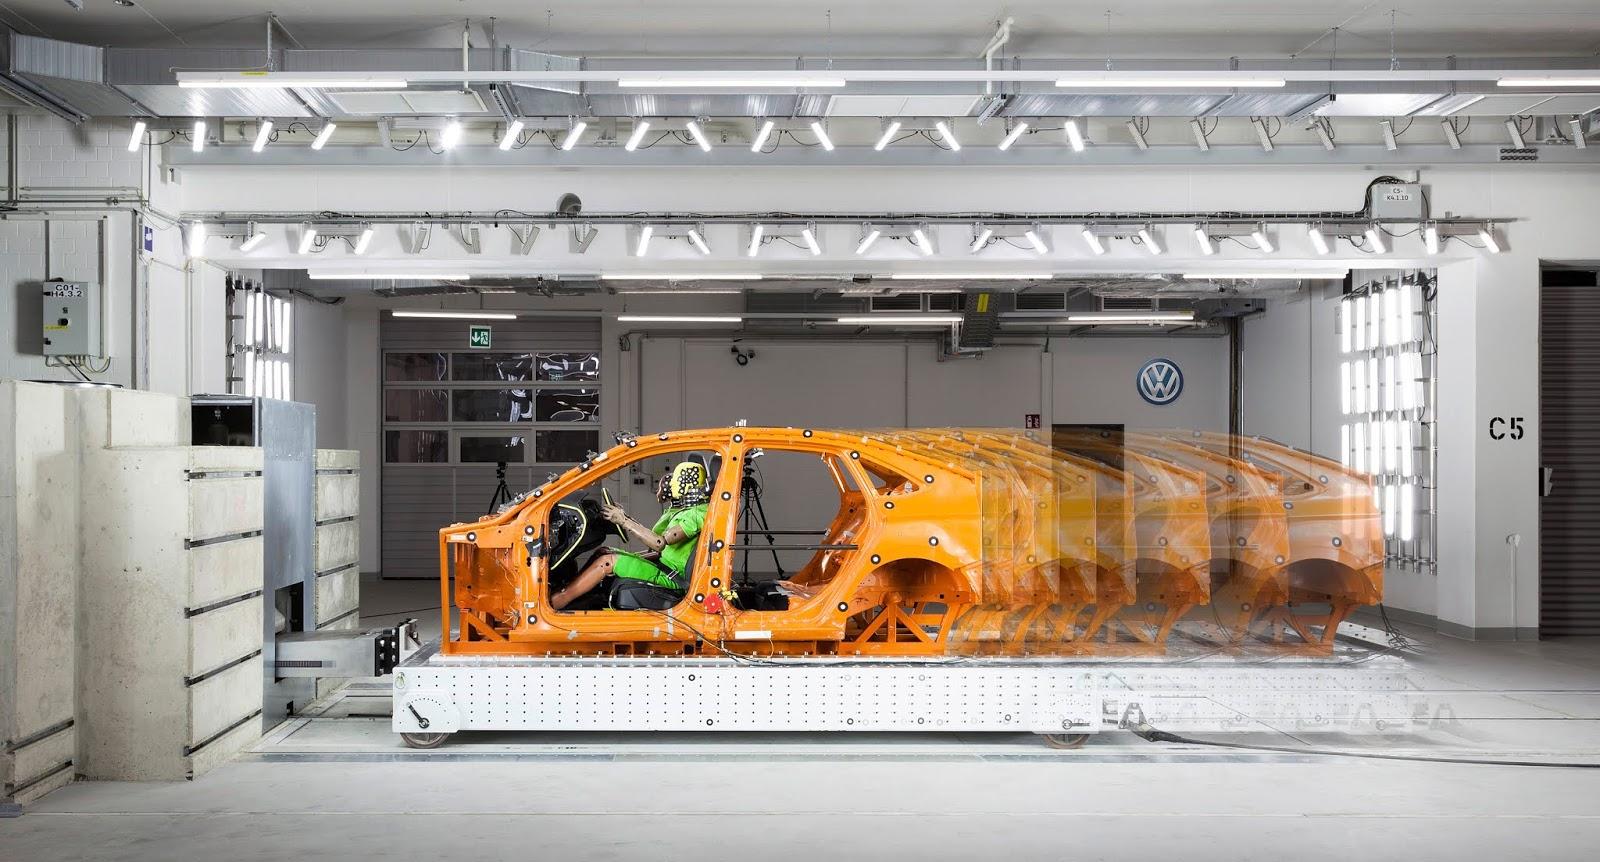 VOLKSWAGEN2BT CROSS2BCRASH2BTESTING2B252812529 Το... μυστικό της VW για τα crash tests του T-Cross